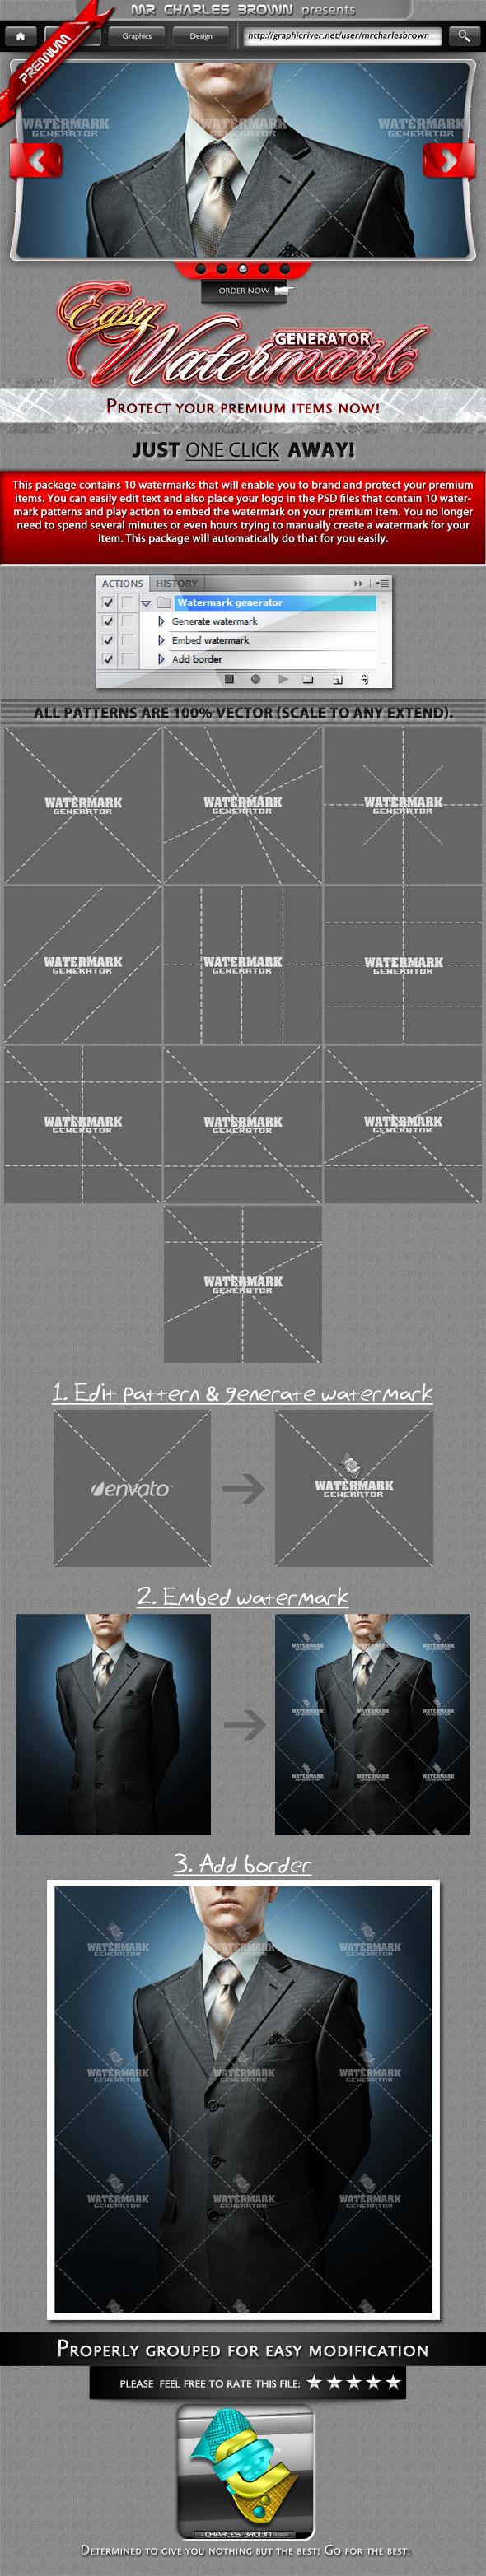 Easy Watermark Generator